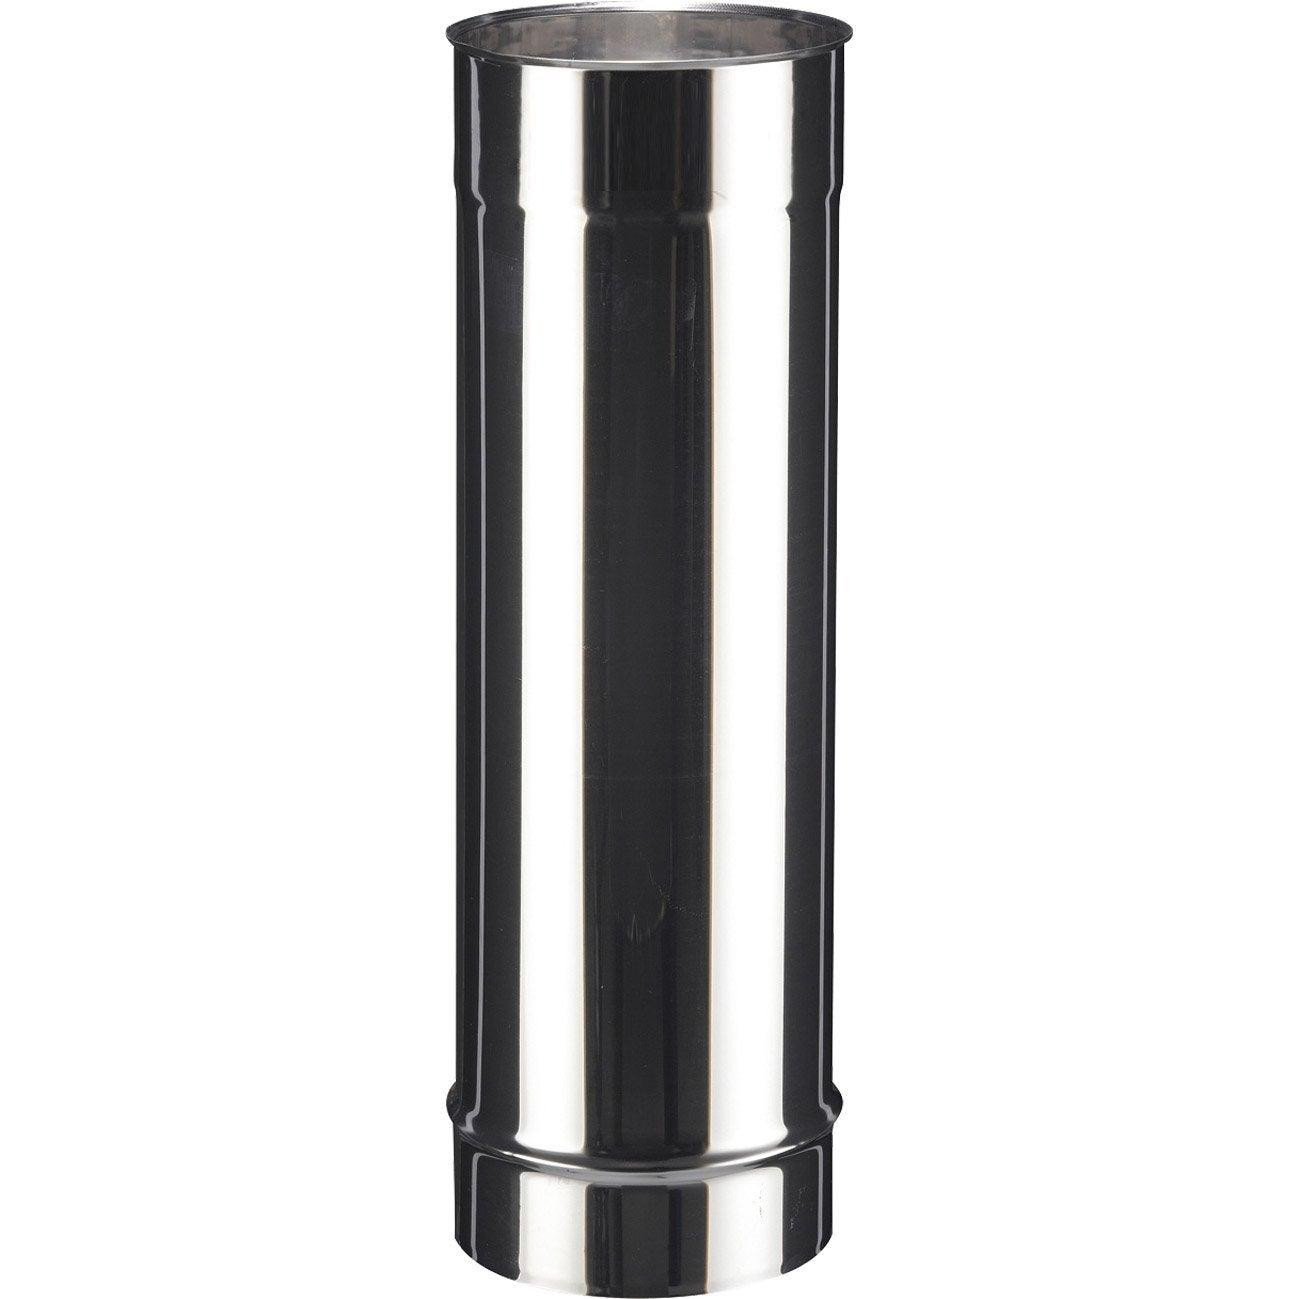 tuyau inox de raccordement poujoulat diam 110 mm 50 cm leroy merlin. Black Bedroom Furniture Sets. Home Design Ideas